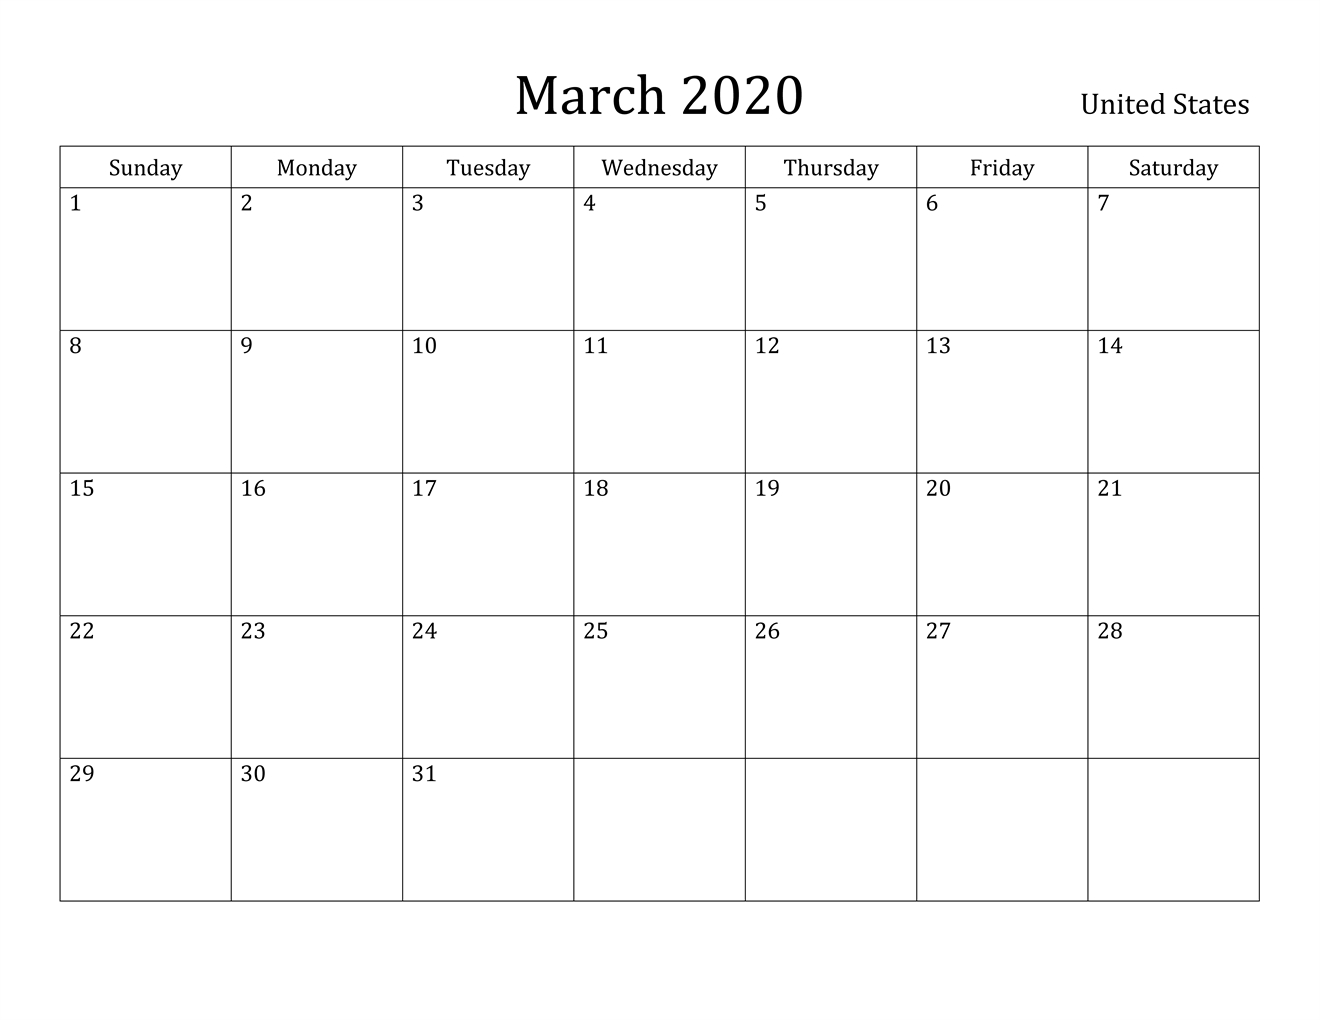 Free March 2020 Printable Calendar - Blank Templates -